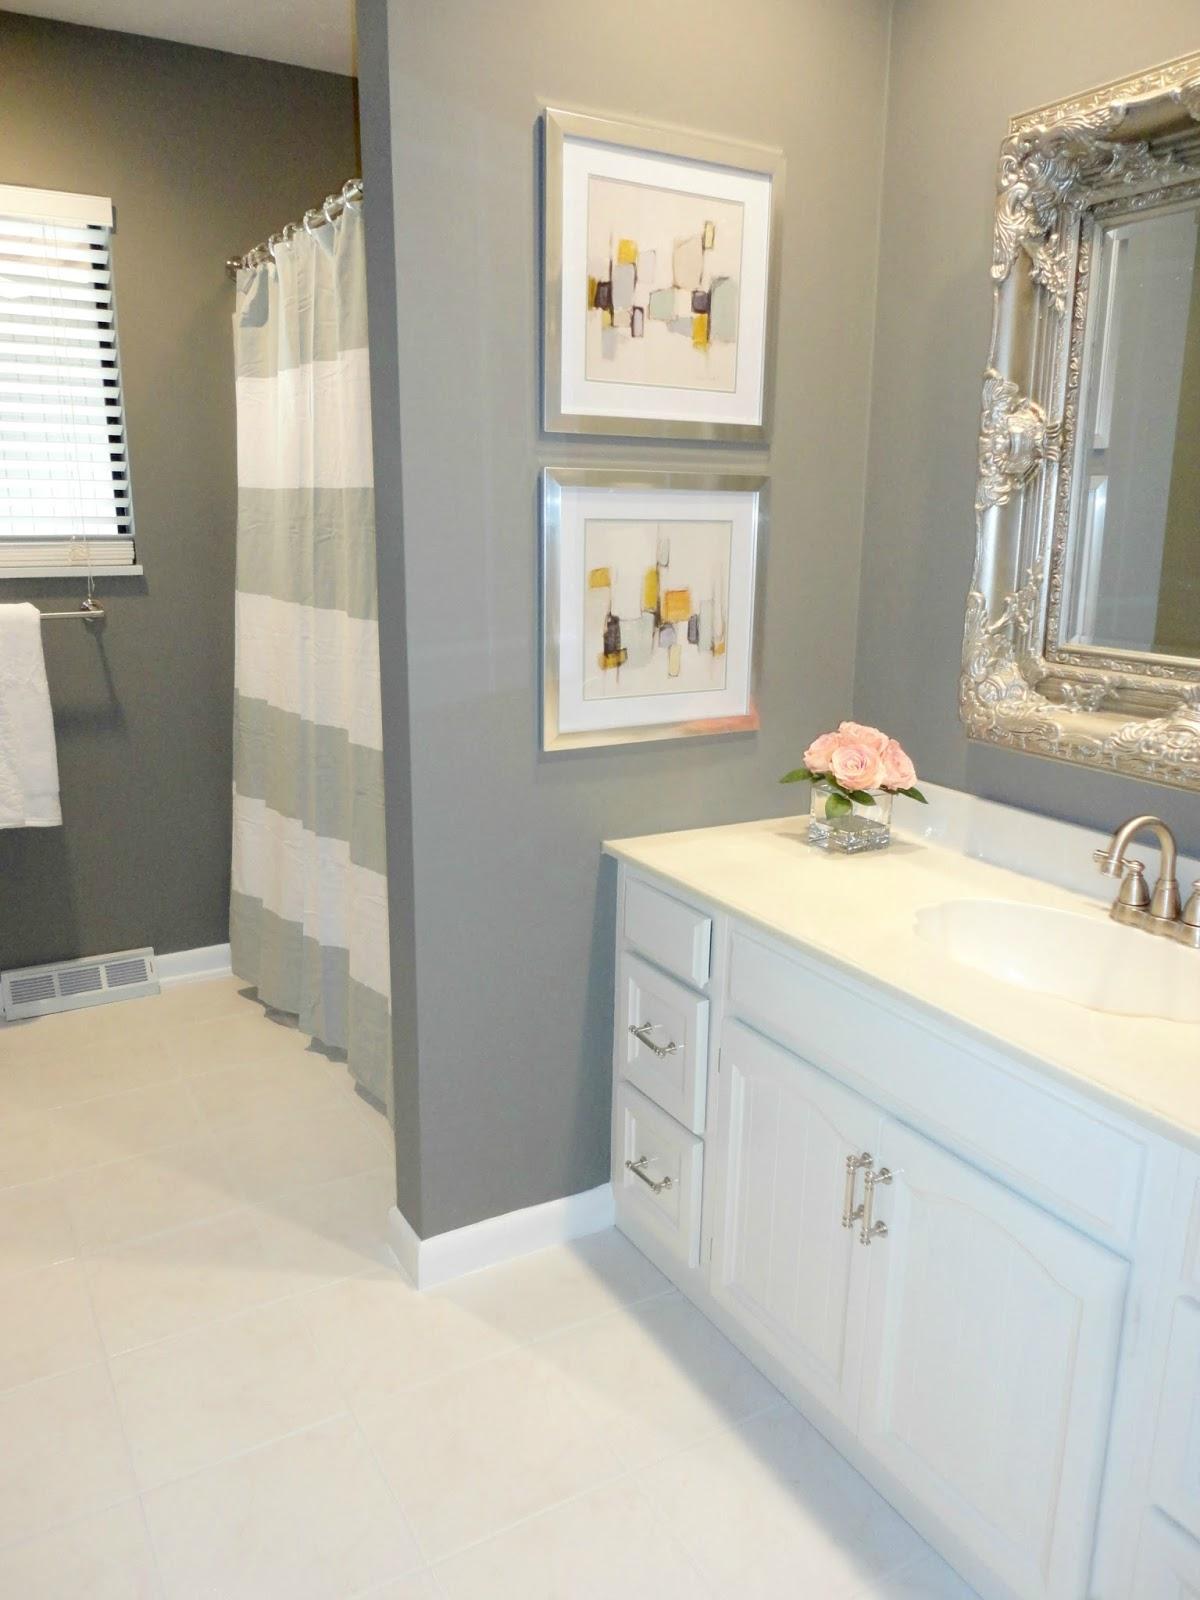 DIY Bathroom Remodel on a Budget | LiveLoveDIY | Bloglovin'